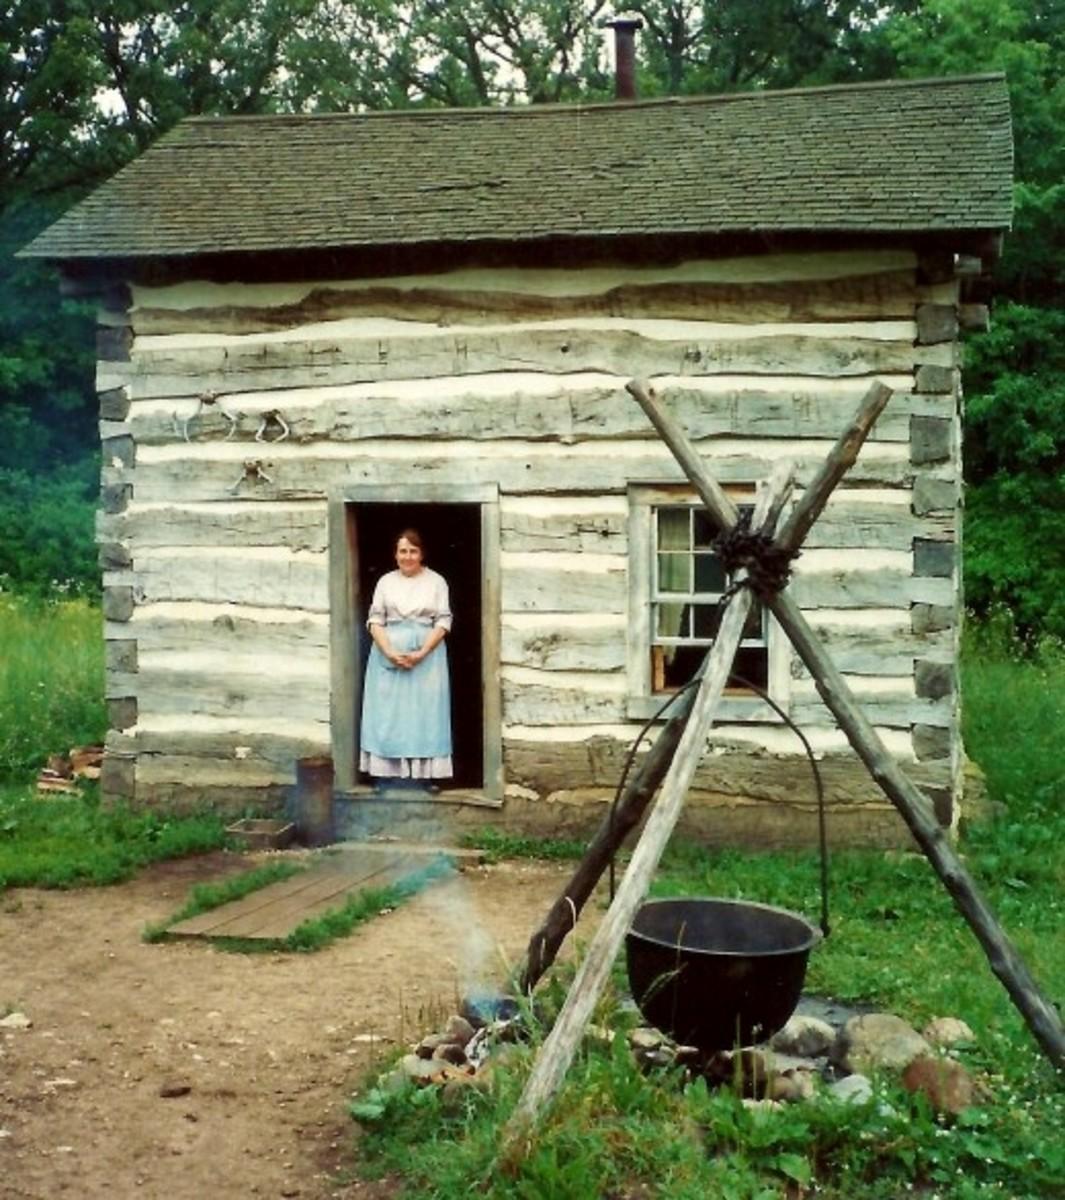 Fossebrekke House at Old World Wisconsin